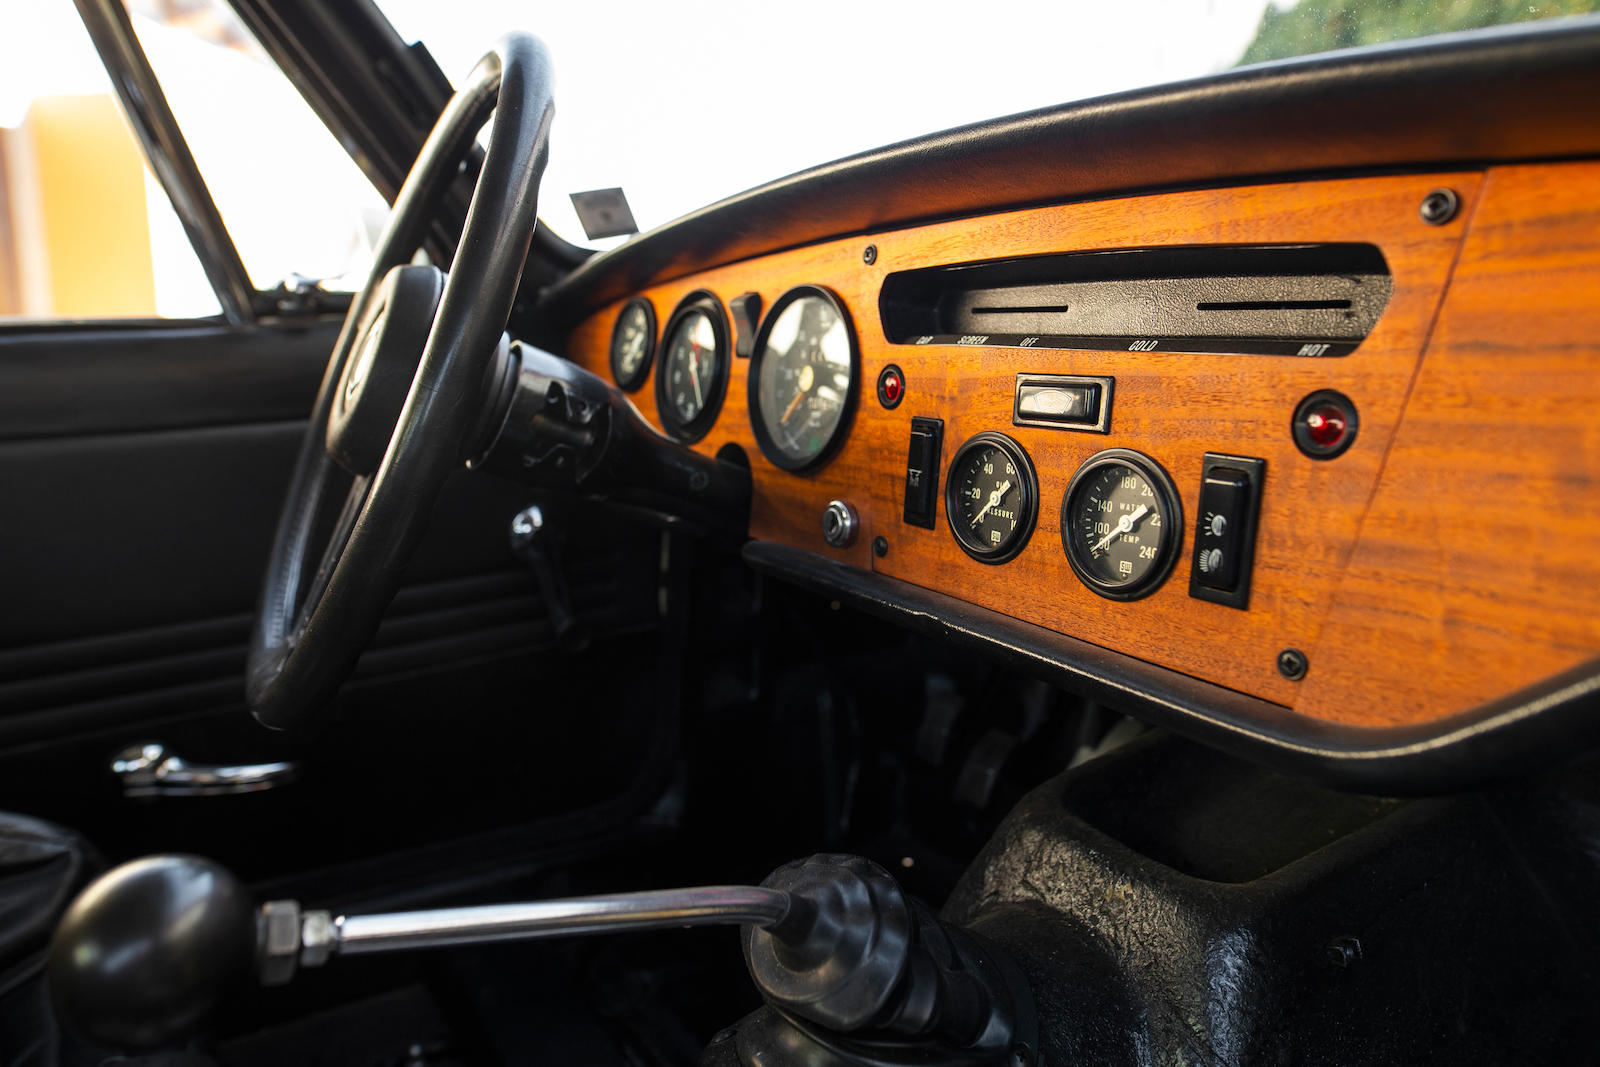 1969 Triumph GT6+ Mk II interior